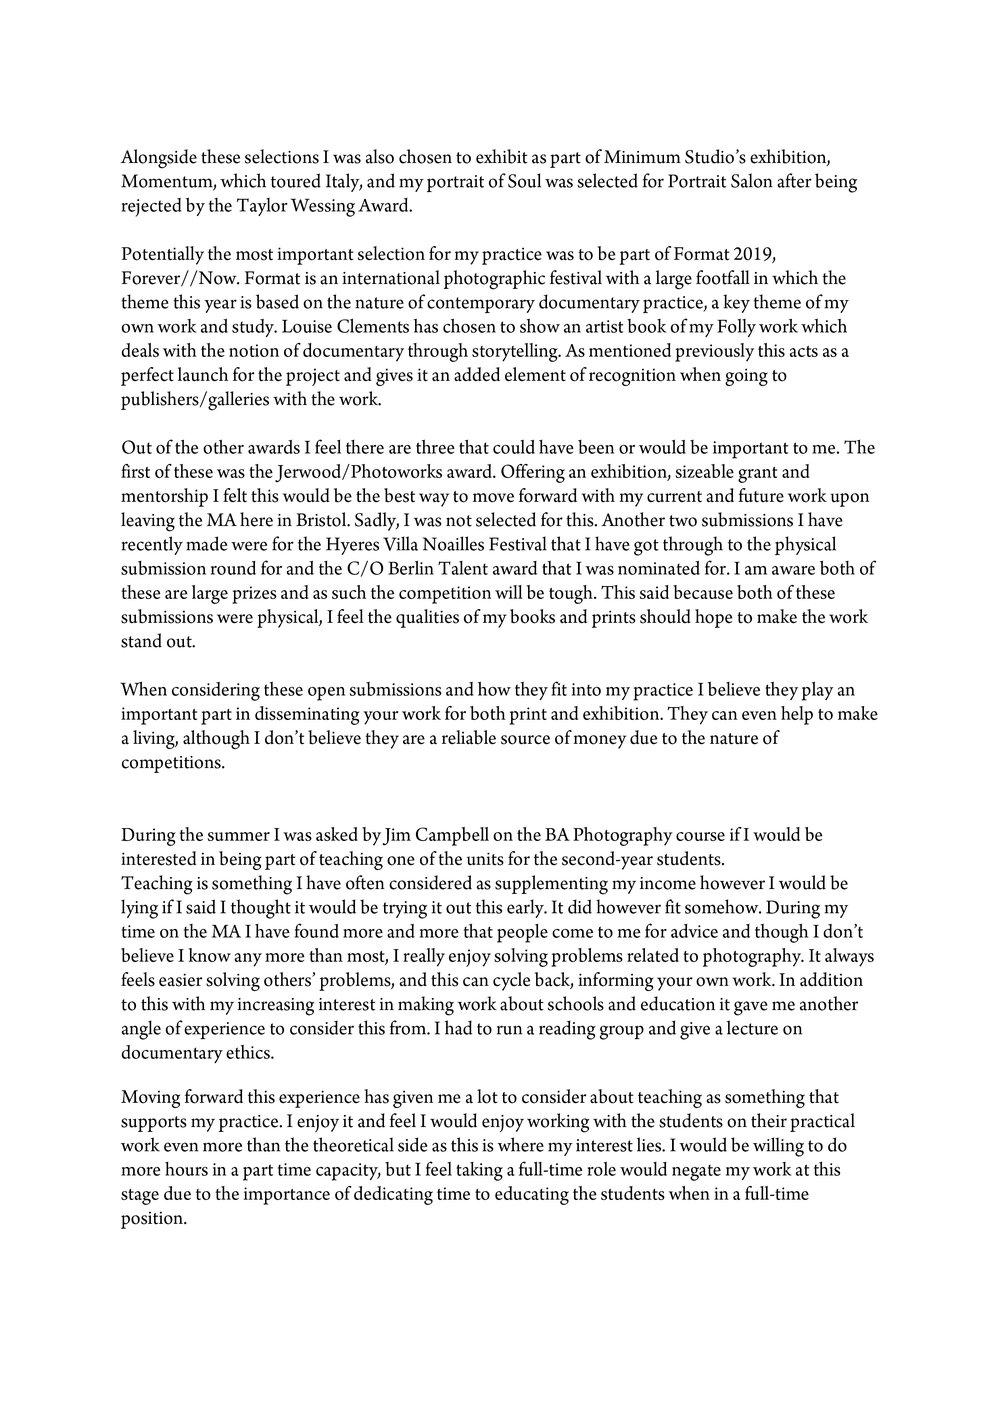 Evaluative Report - Jamie Murray-6.jpg